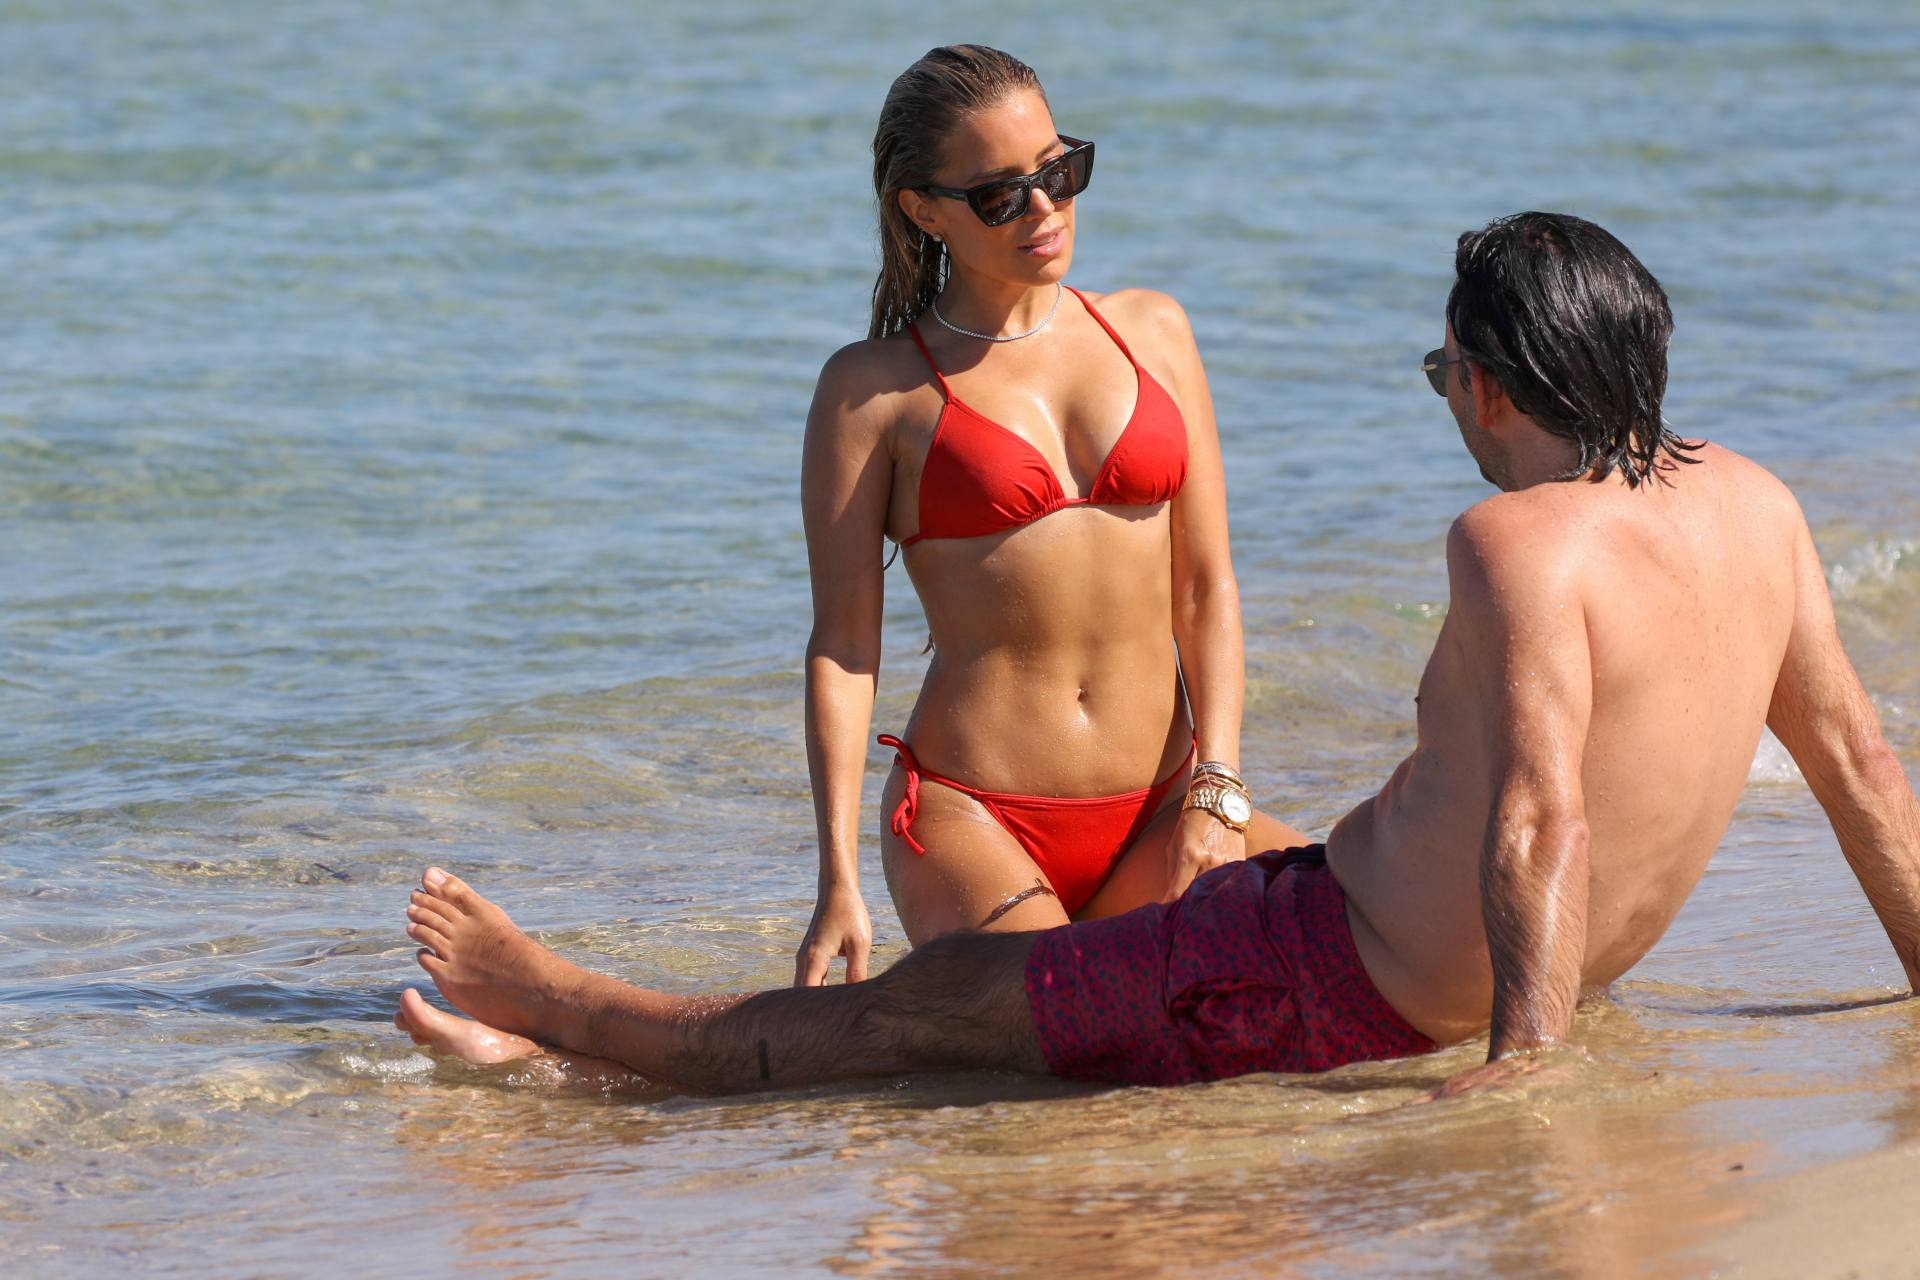 Sylvie Meis – Beautiful Body In Sexy Bikini On The Beach In Saint Tropez 0024